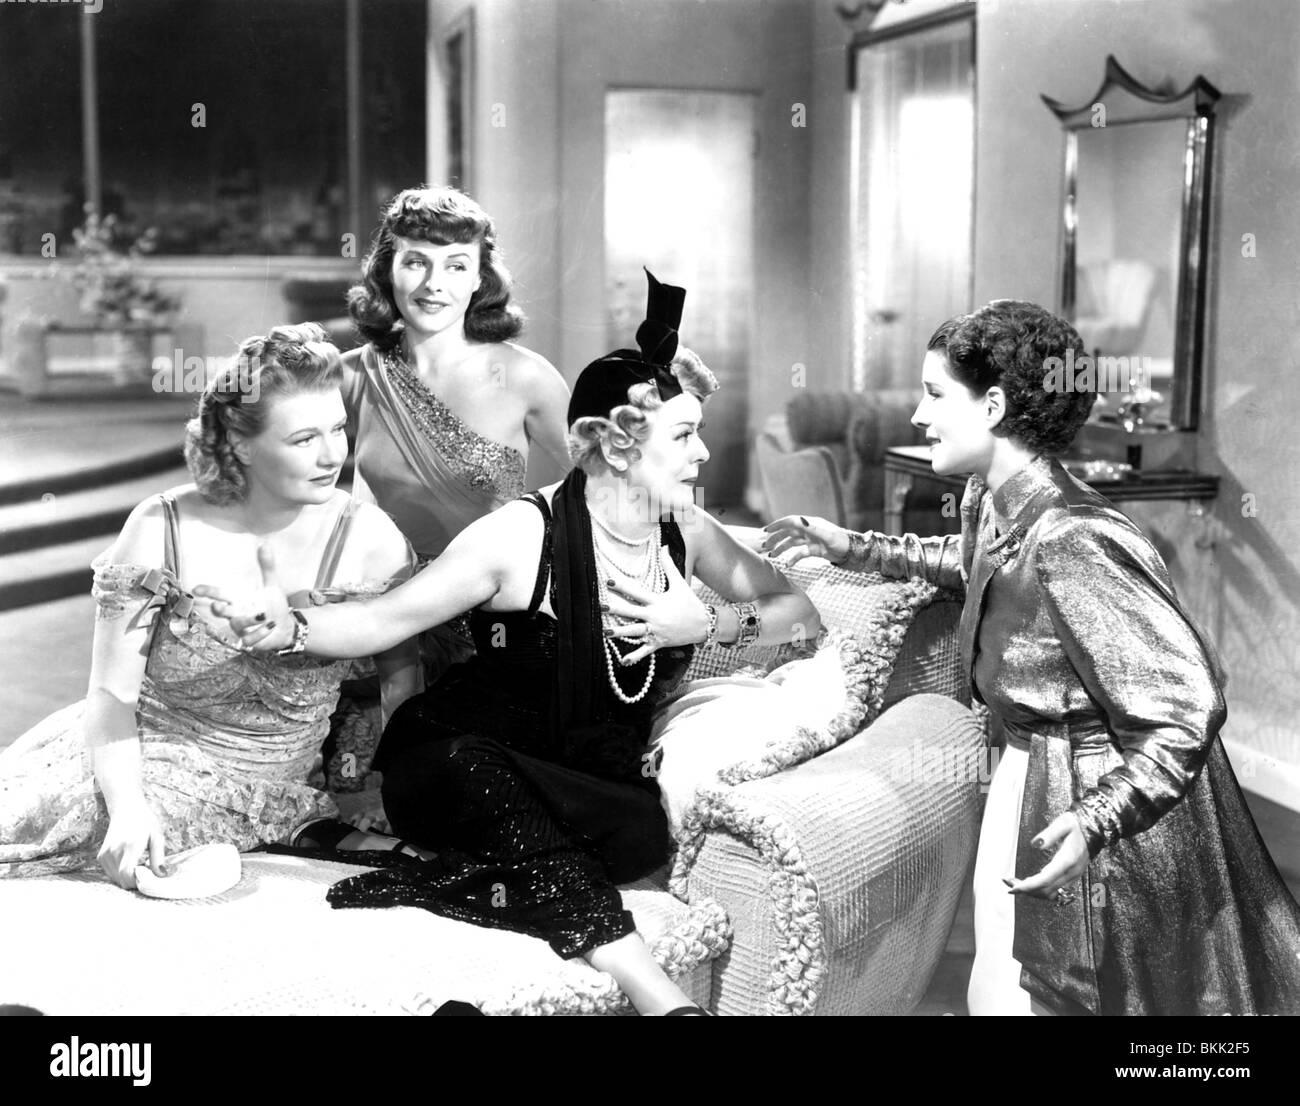 THE WOMEN (1939) PAULETTE GODDARD, NORMA SHEARER WMN 004P - Stock Image